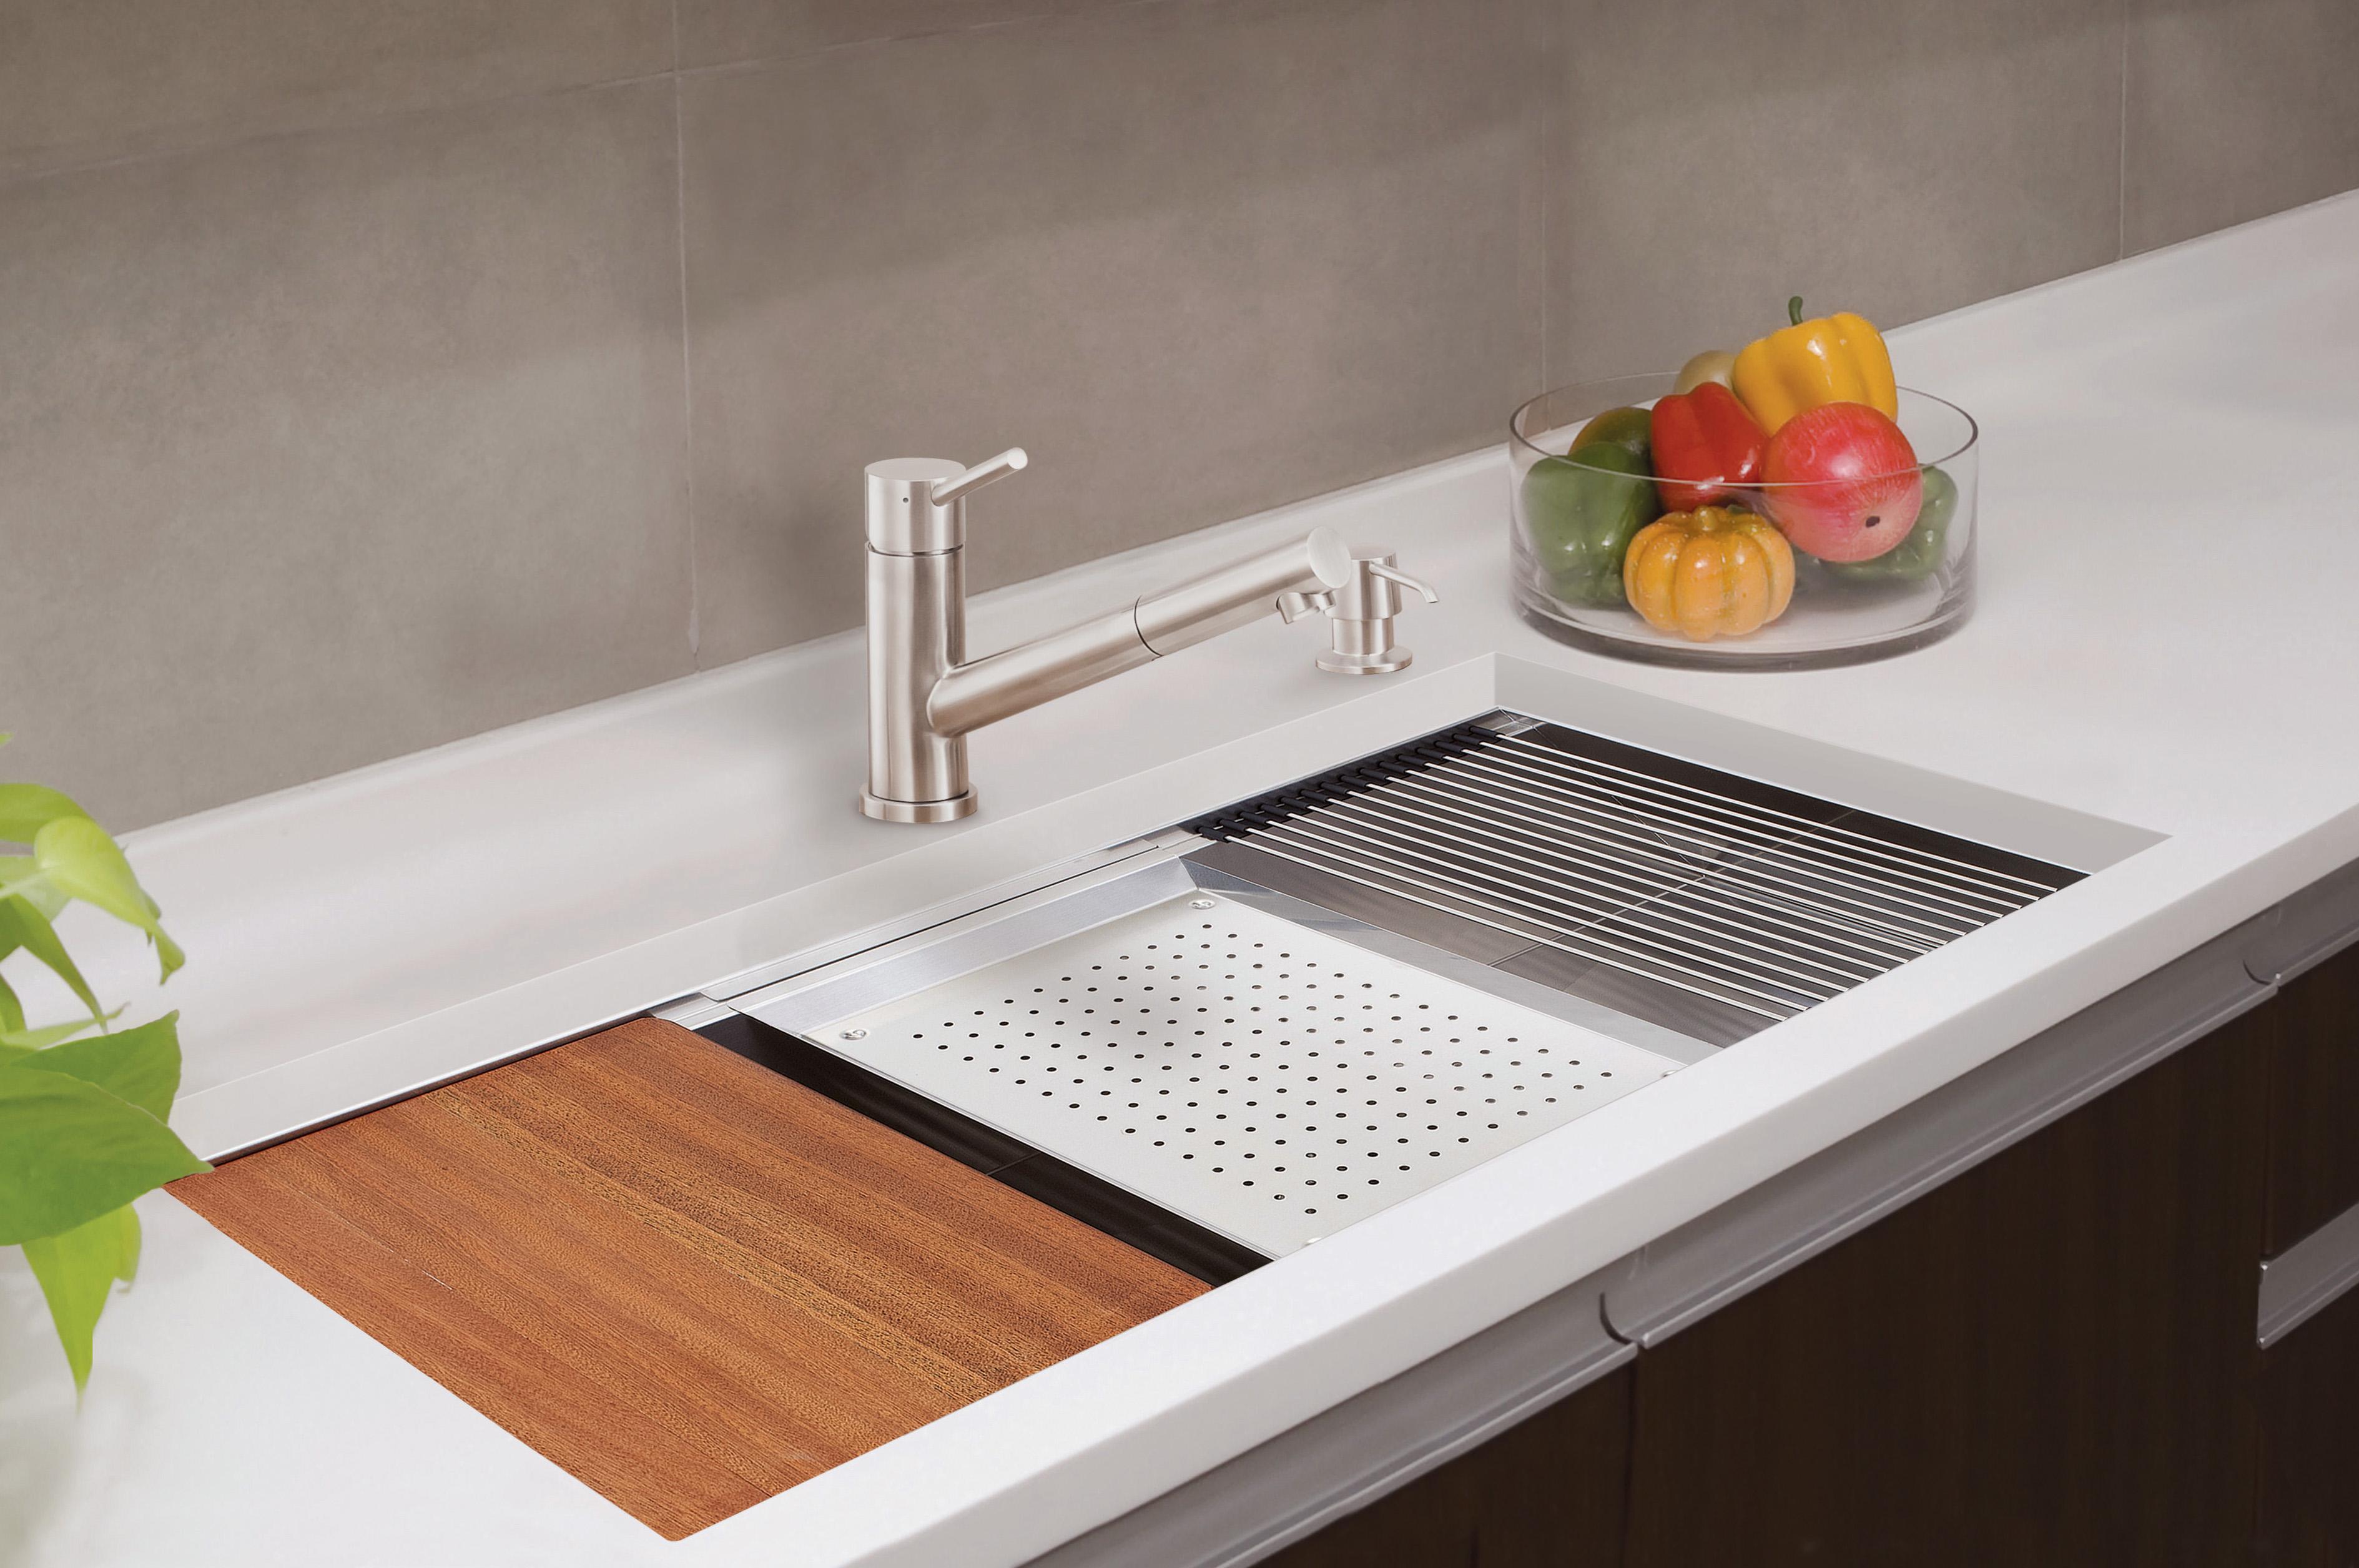 lenova ledge prep sink brings sleek style functionality stainless kitchen sinks Lenova Ledge Prep Sink Brings Sleek Style Functionality Remodeling Sinks Kitchen Products Lenova